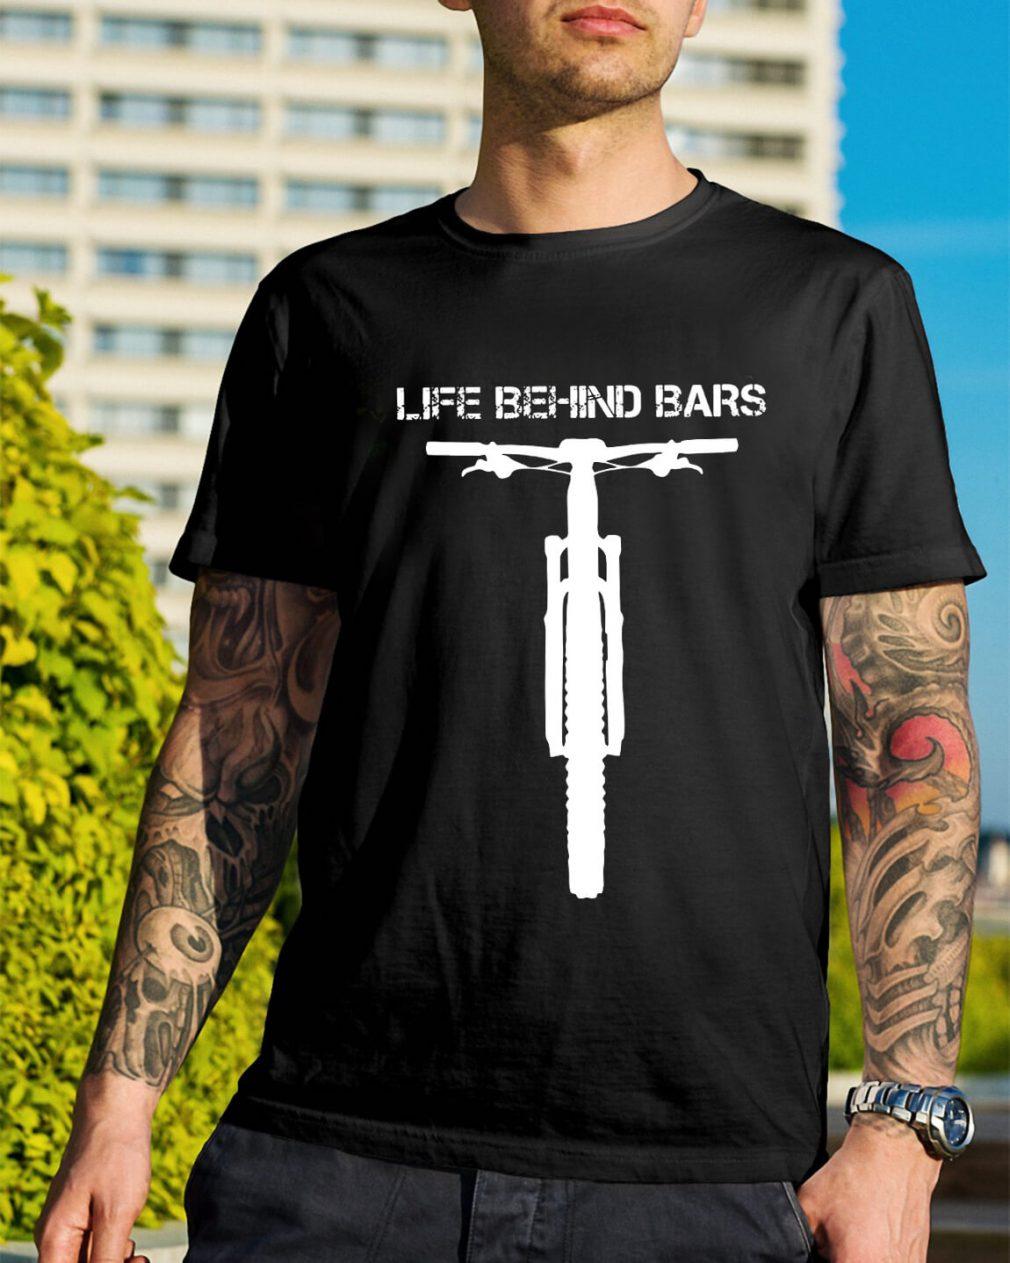 Mountain bike life behind bars shirt